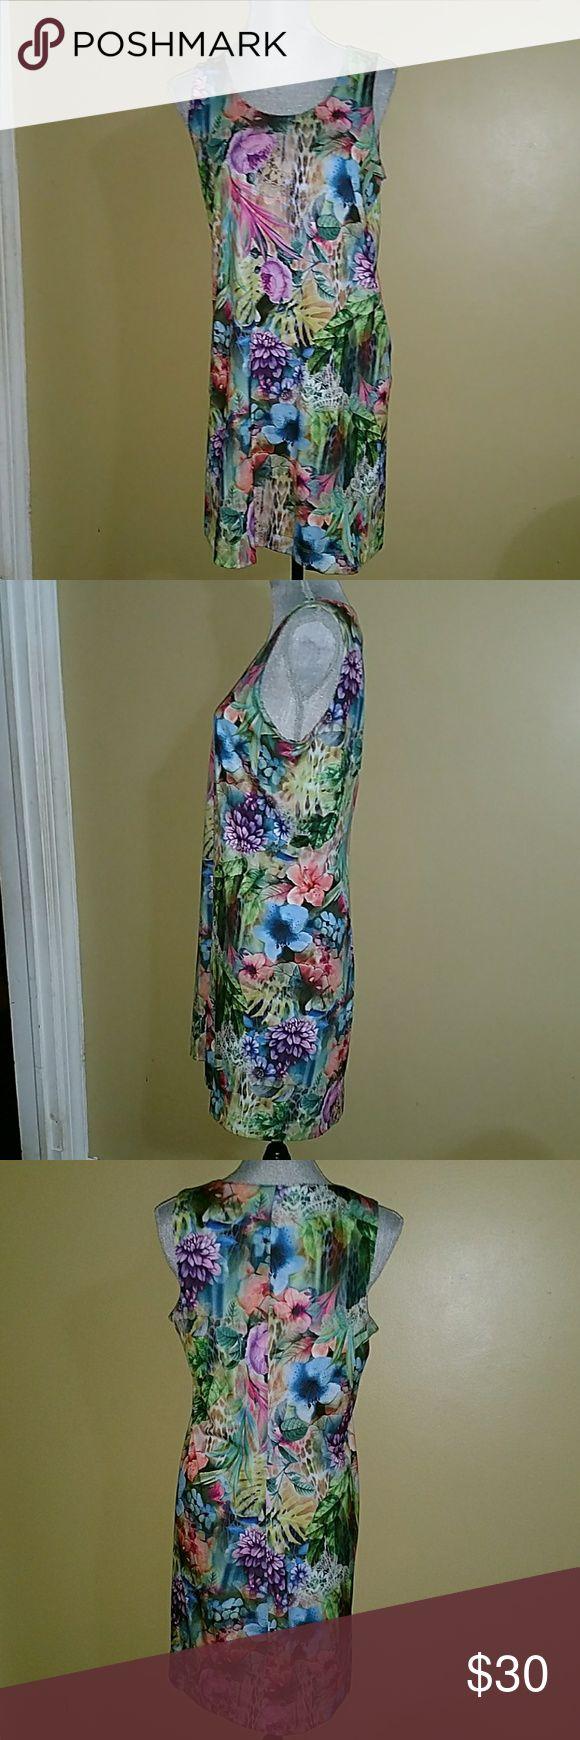 Carmen Marc Valvo Flower Print Dress Worn once, like new. Perfect luau party dress or any occasion. Slip on dress, no zipper closure. Soft, light weight. Carmen Marc Valvo Dresses Midi